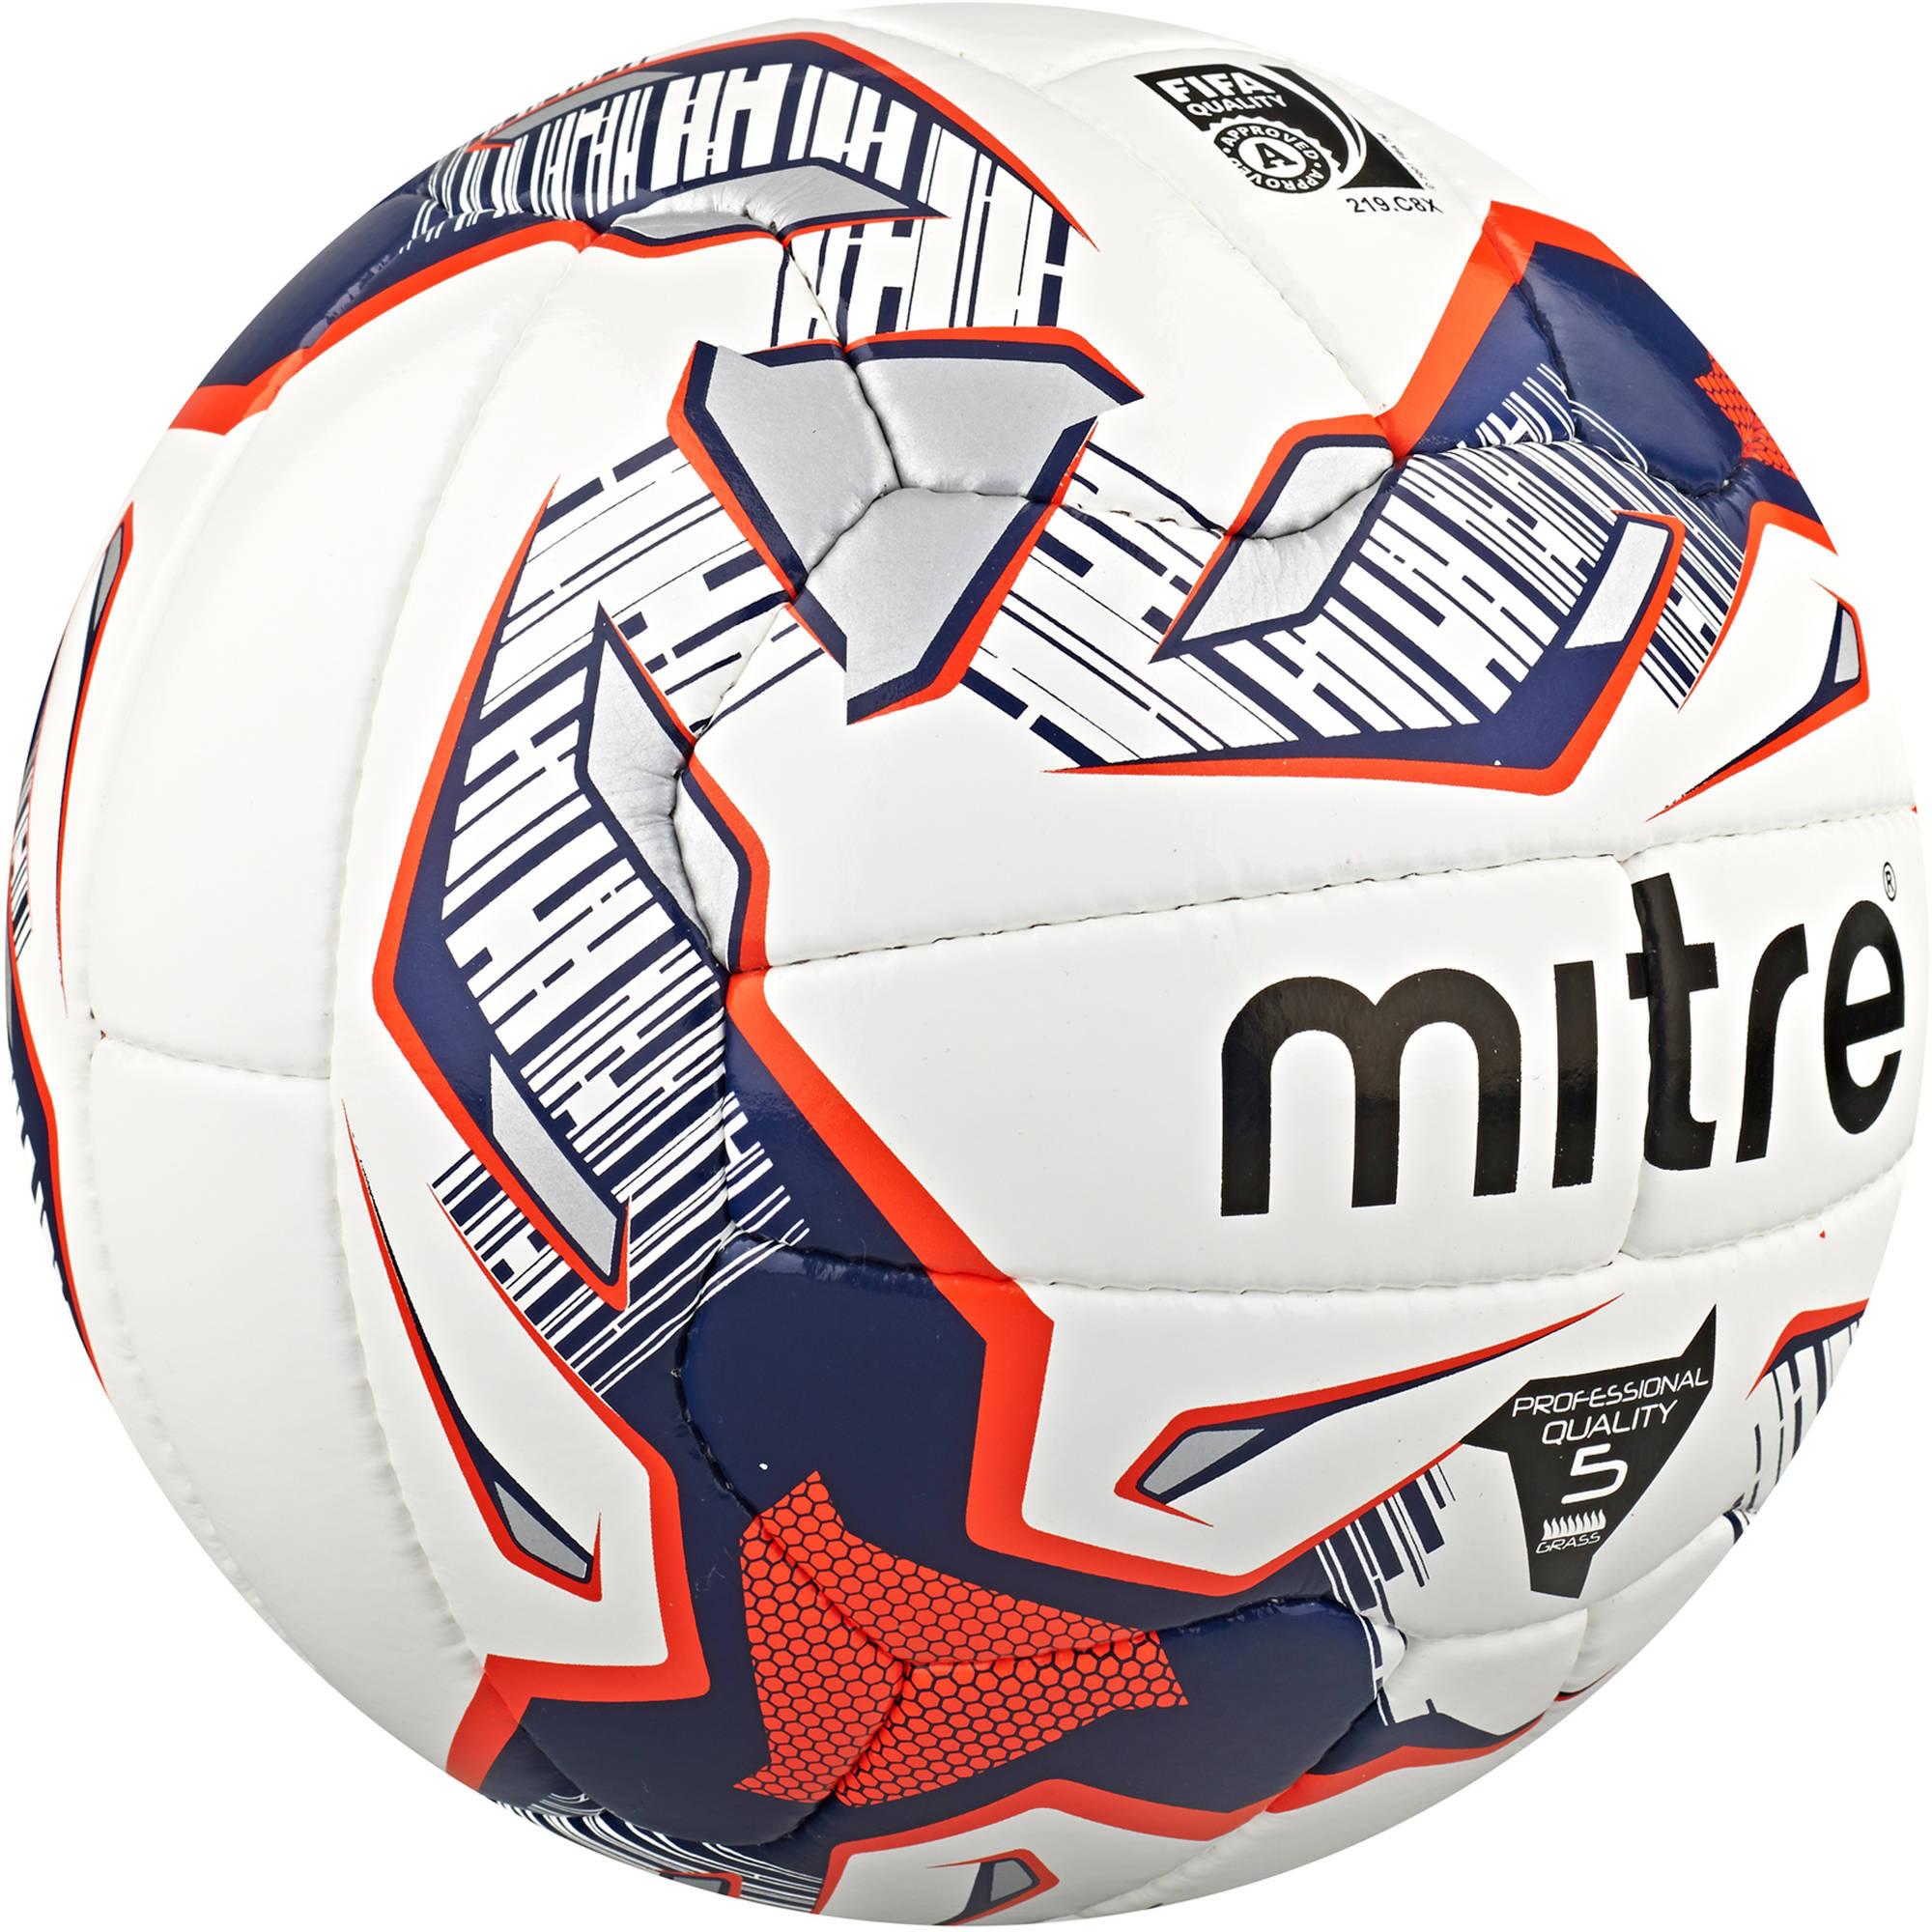 Mitre #5 Ultimax D26P Soccer Ball